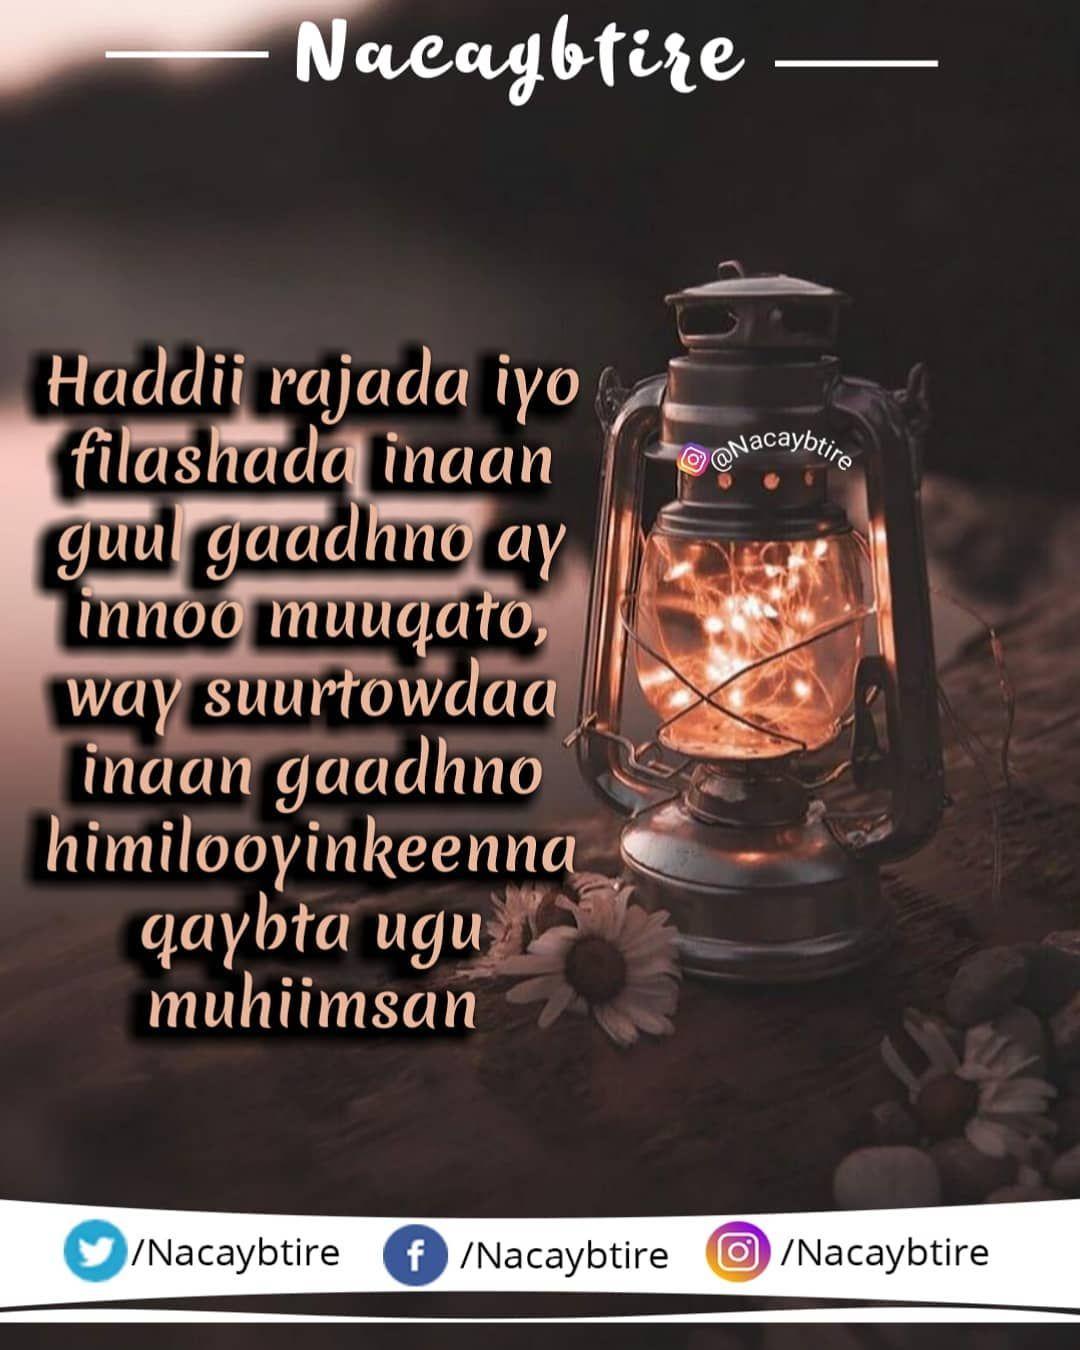 Rajo Guul Iyo Himilo Nacaybtire Guul Guusha Nolosha Quotesomali Quote Quotes Xikmad Xikmado Somali Quotes Somali Iyo